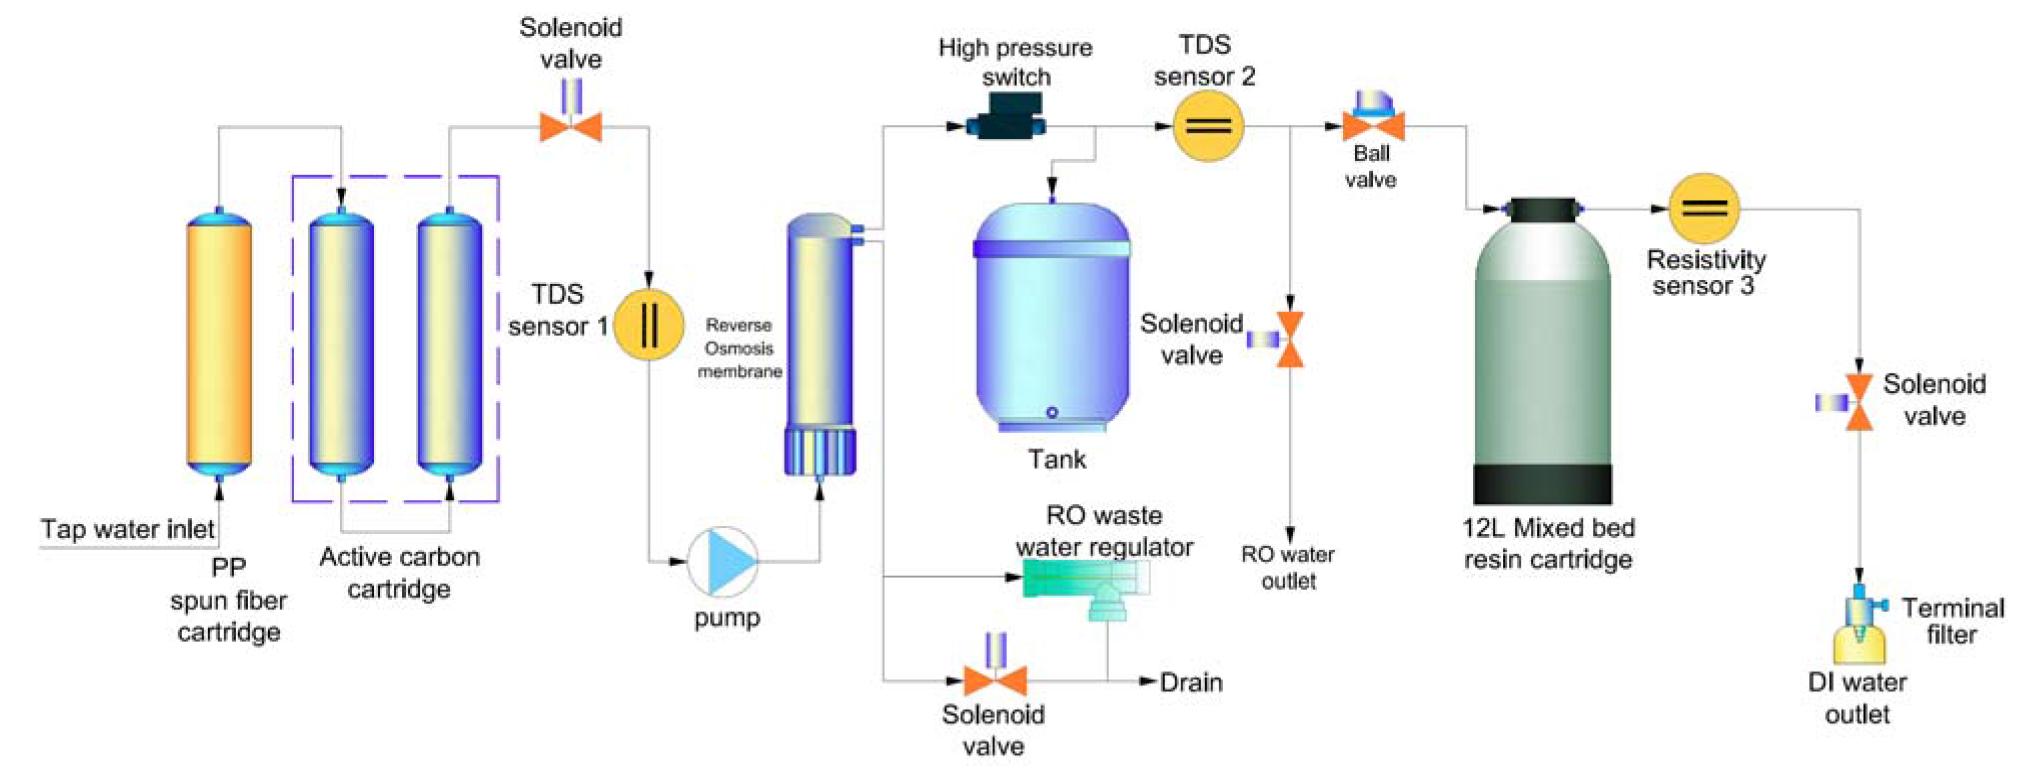 reverse osmosis pressure regulator diagram advantages of er diagram critical path method diagram. Black Bedroom Furniture Sets. Home Design Ideas